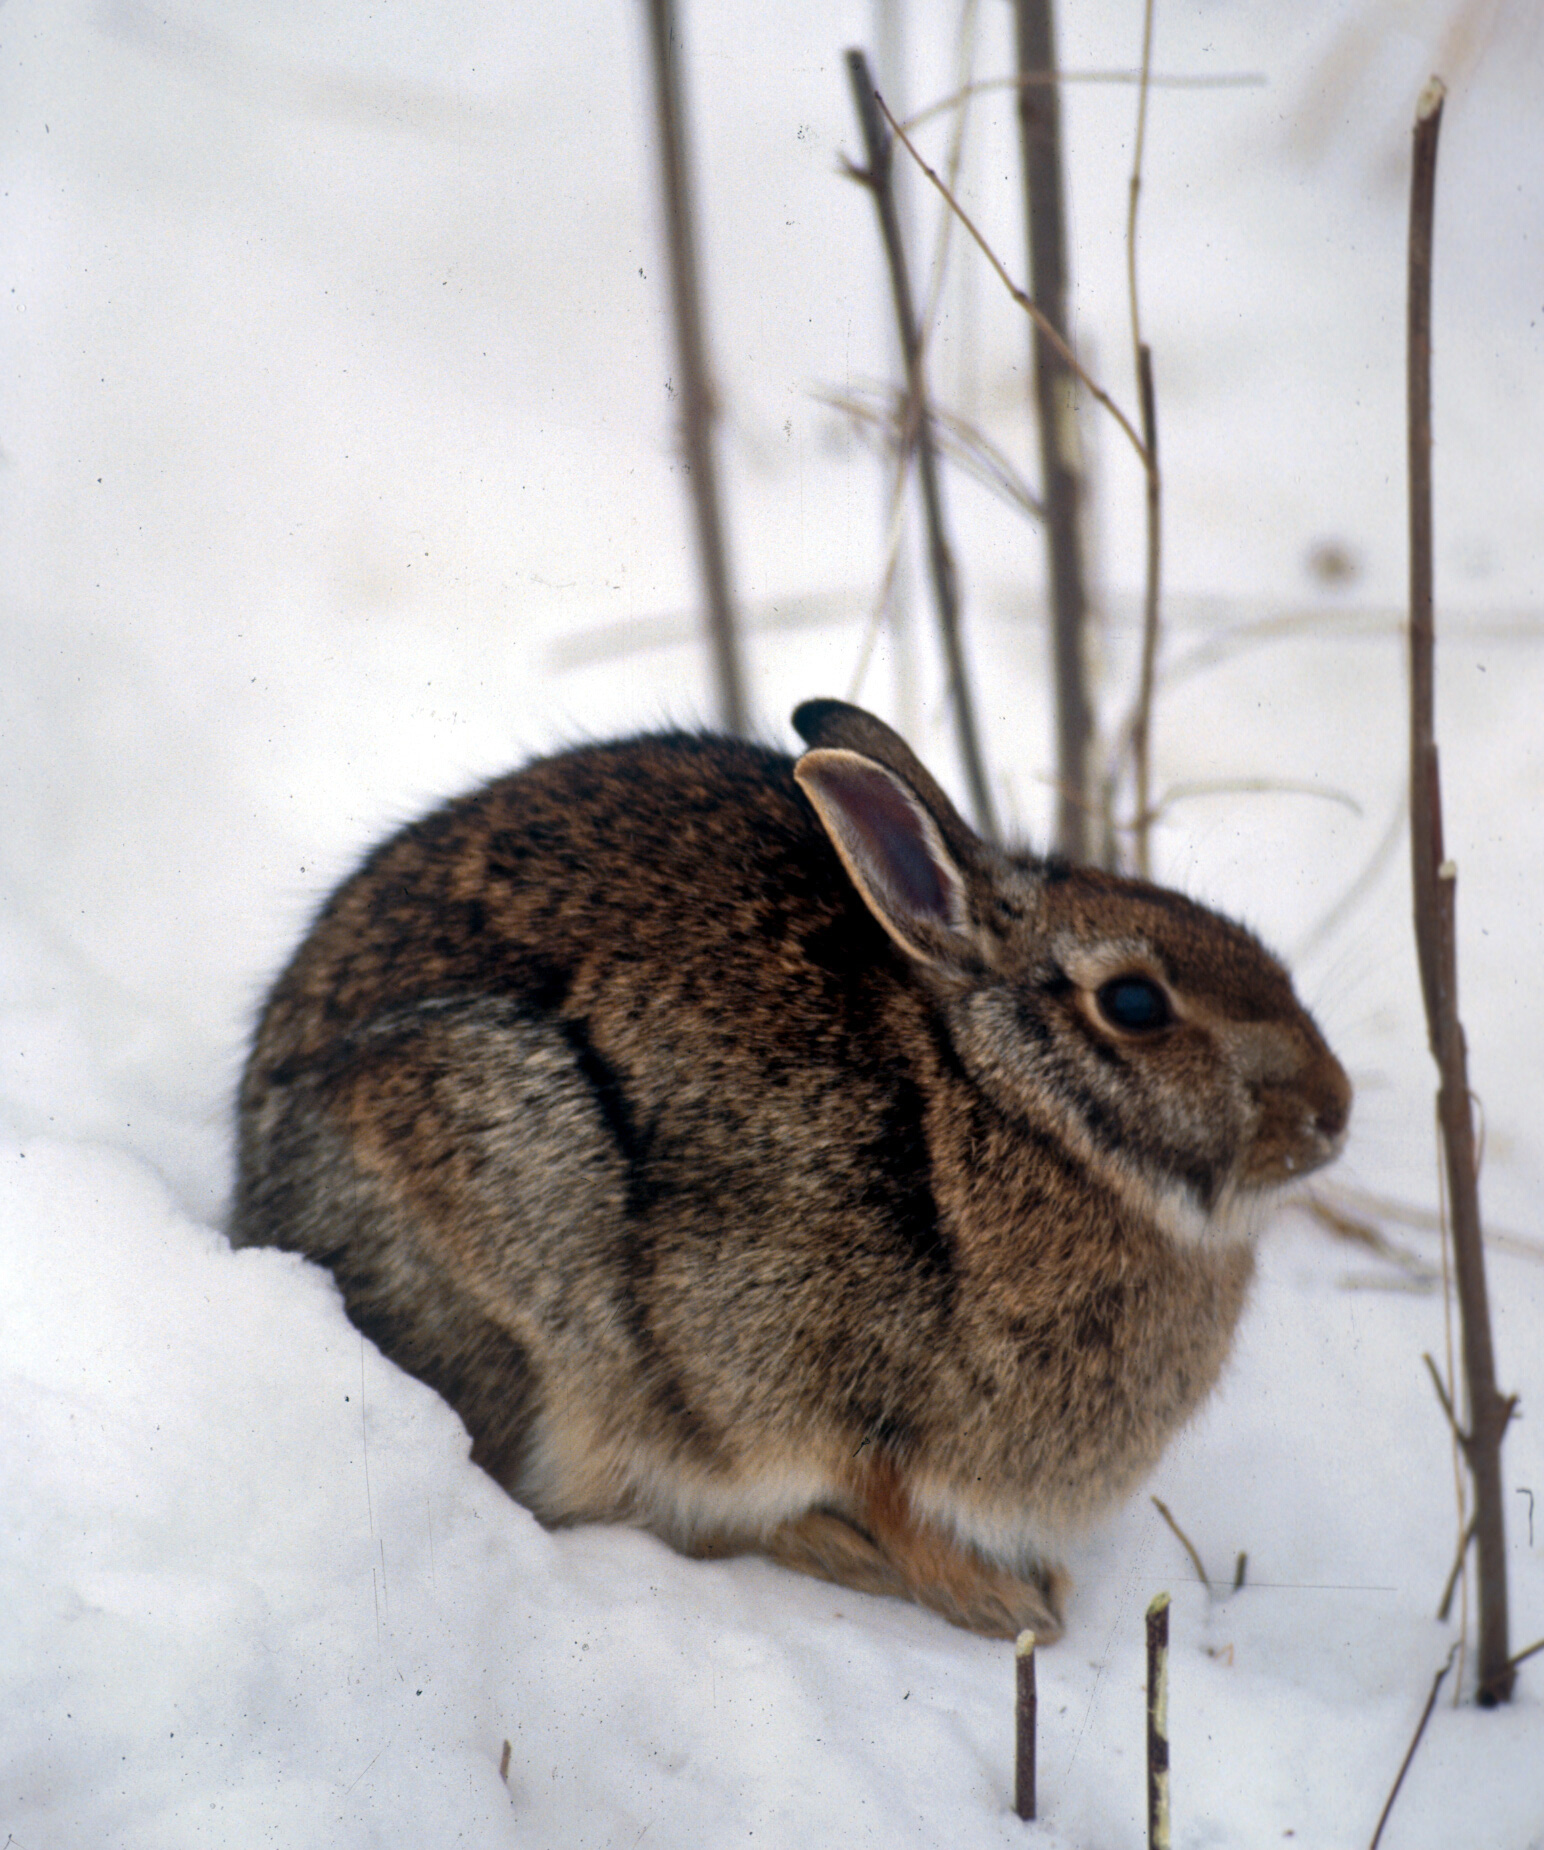 Drawn rabbit wild rabbit Rabbit Rabbit eastern Eastern cottontail